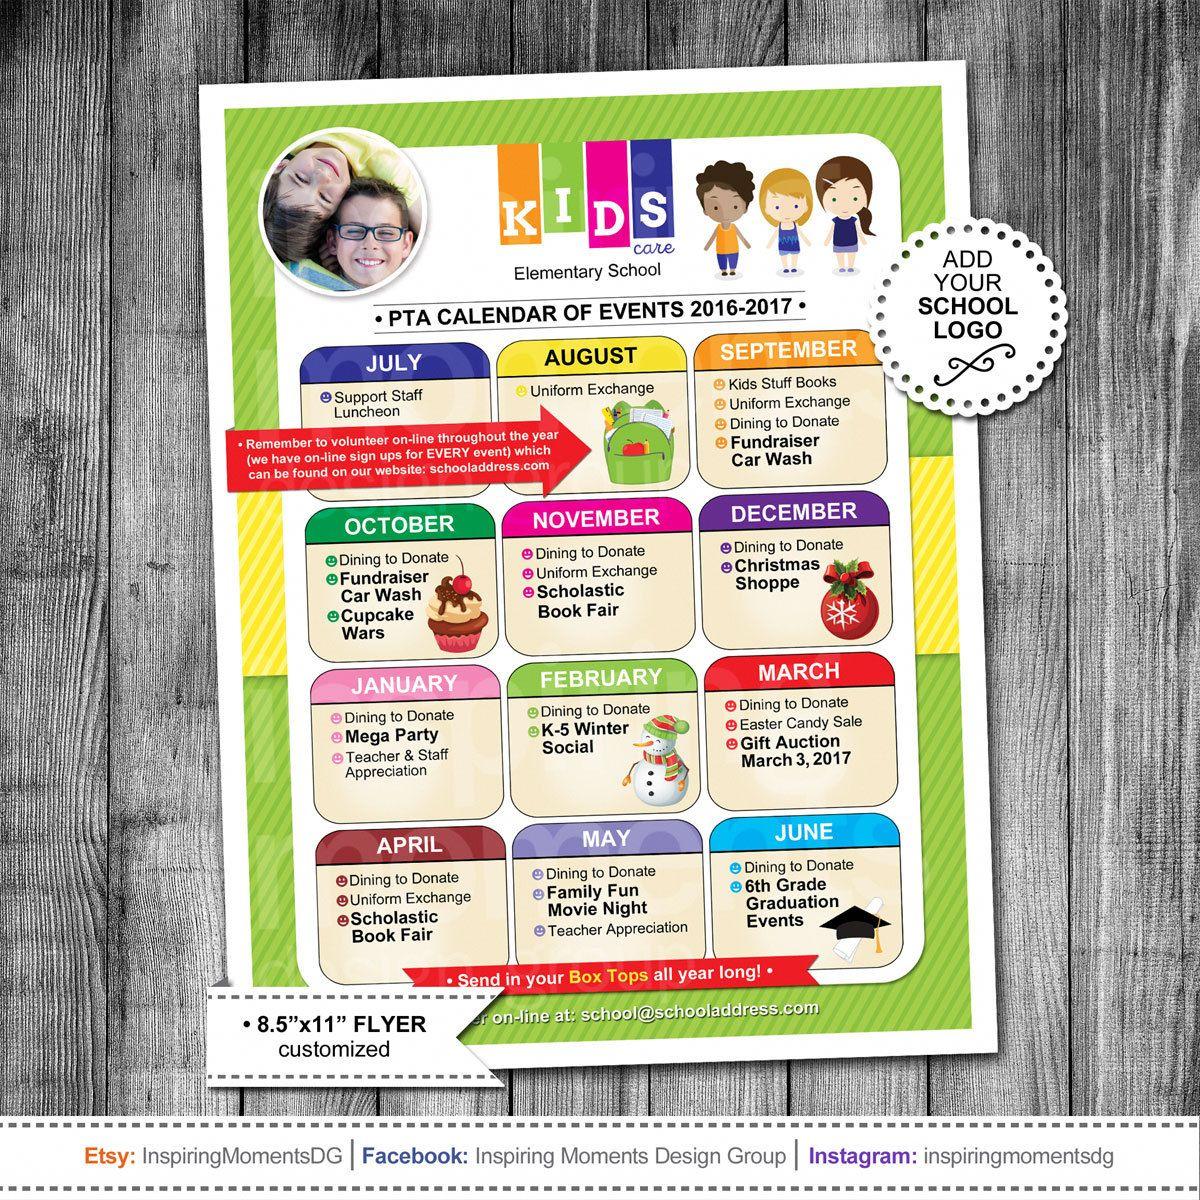 Event Flyer Printable | PTA Calendar | PTN Calendar | School Flyer ...